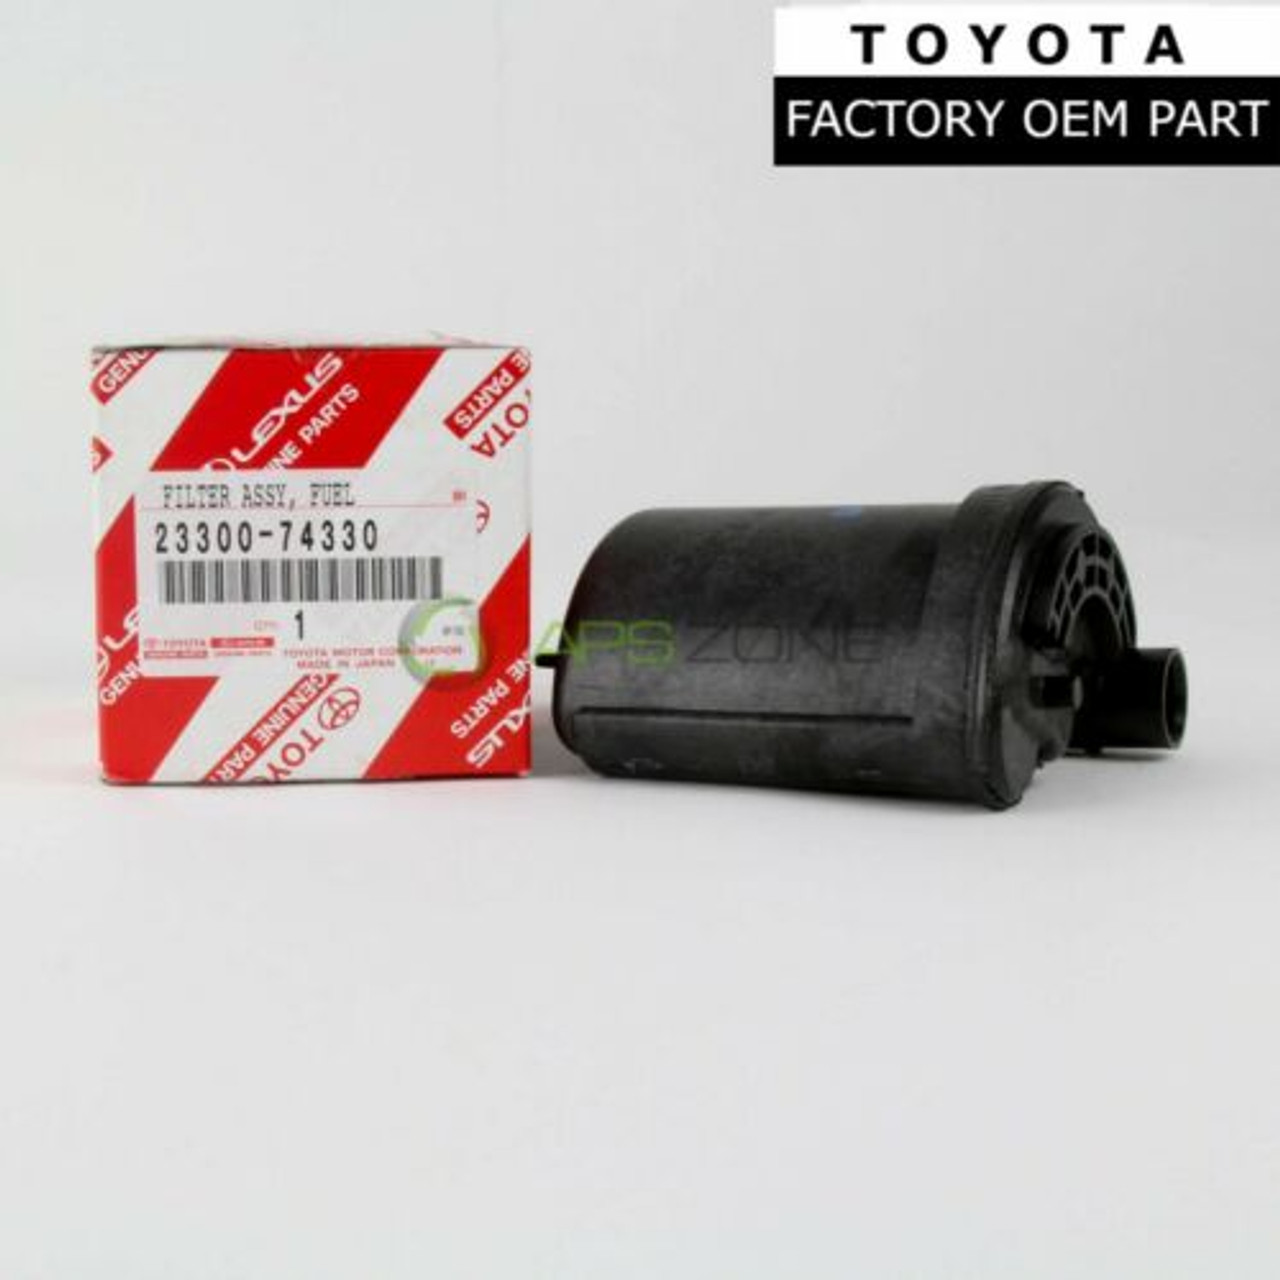 Lexus GS300 GS400 GS450 RX300 Fuel Filter Assembly Genuine OEM 23300-74330    2330074330 - APSZoneAPSZone